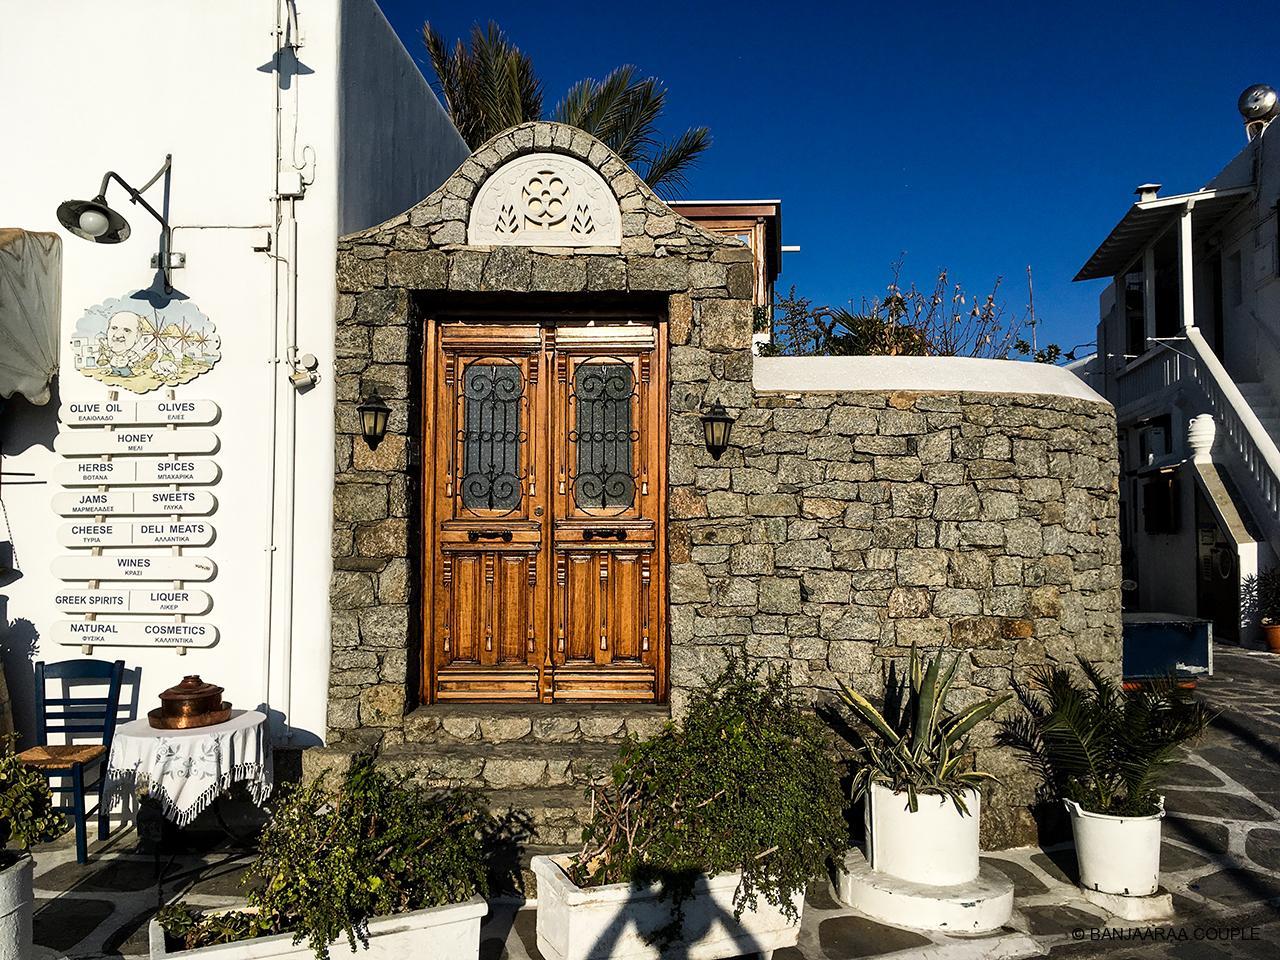 Lazing around the streets of Mykonos